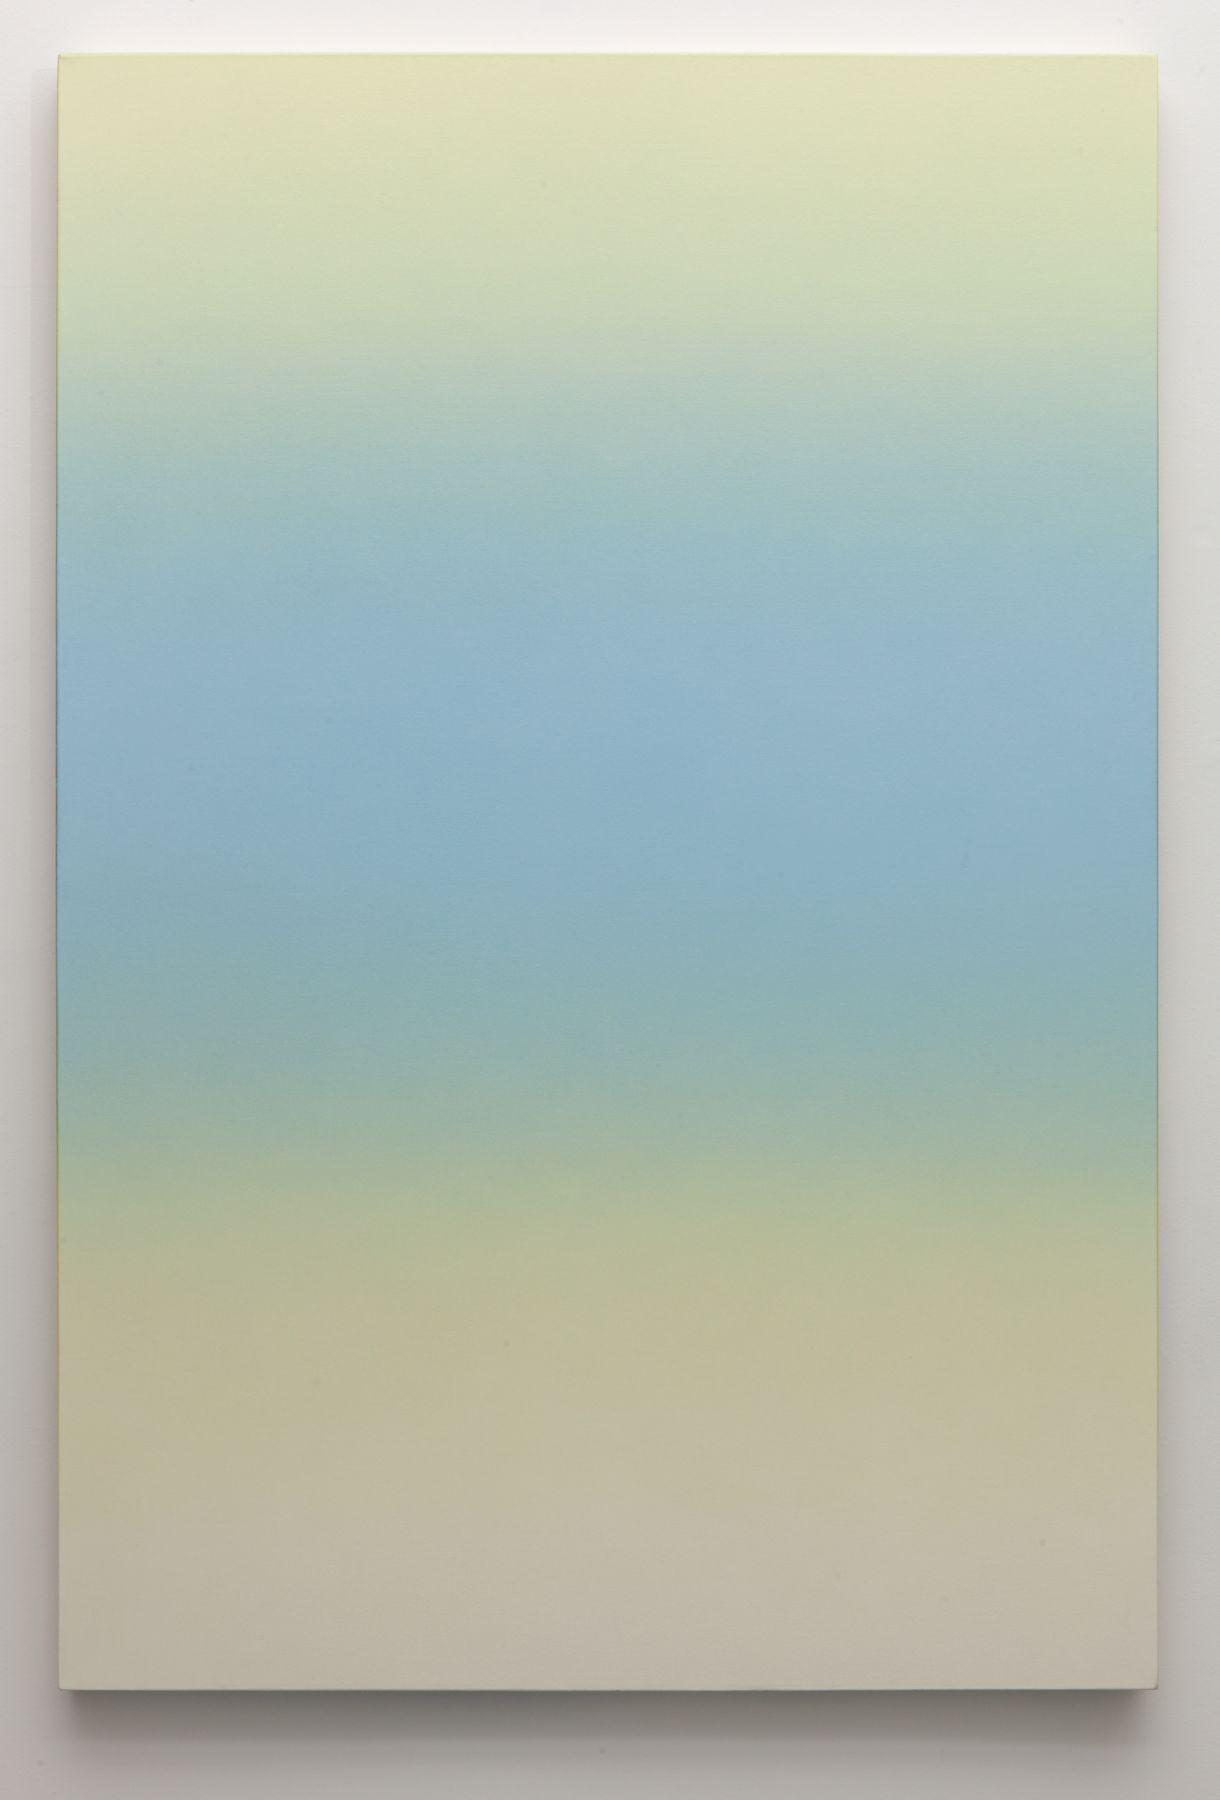 Kristen Cliburn, With Joy, 2014